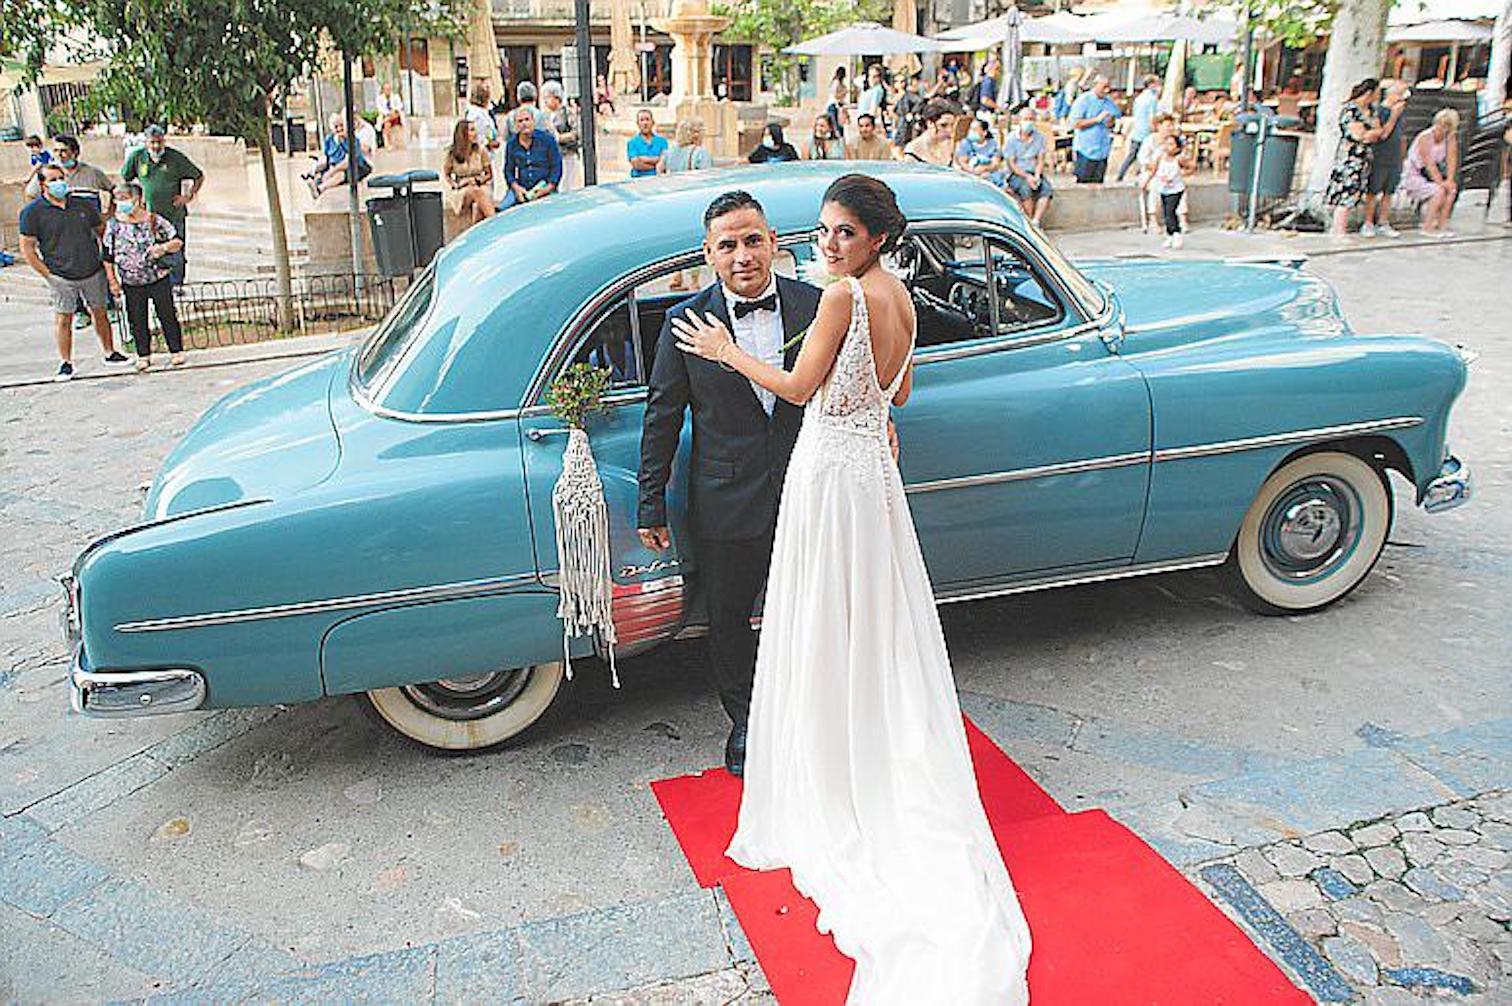 Wedding models with 1952 Chevrolet Styline.